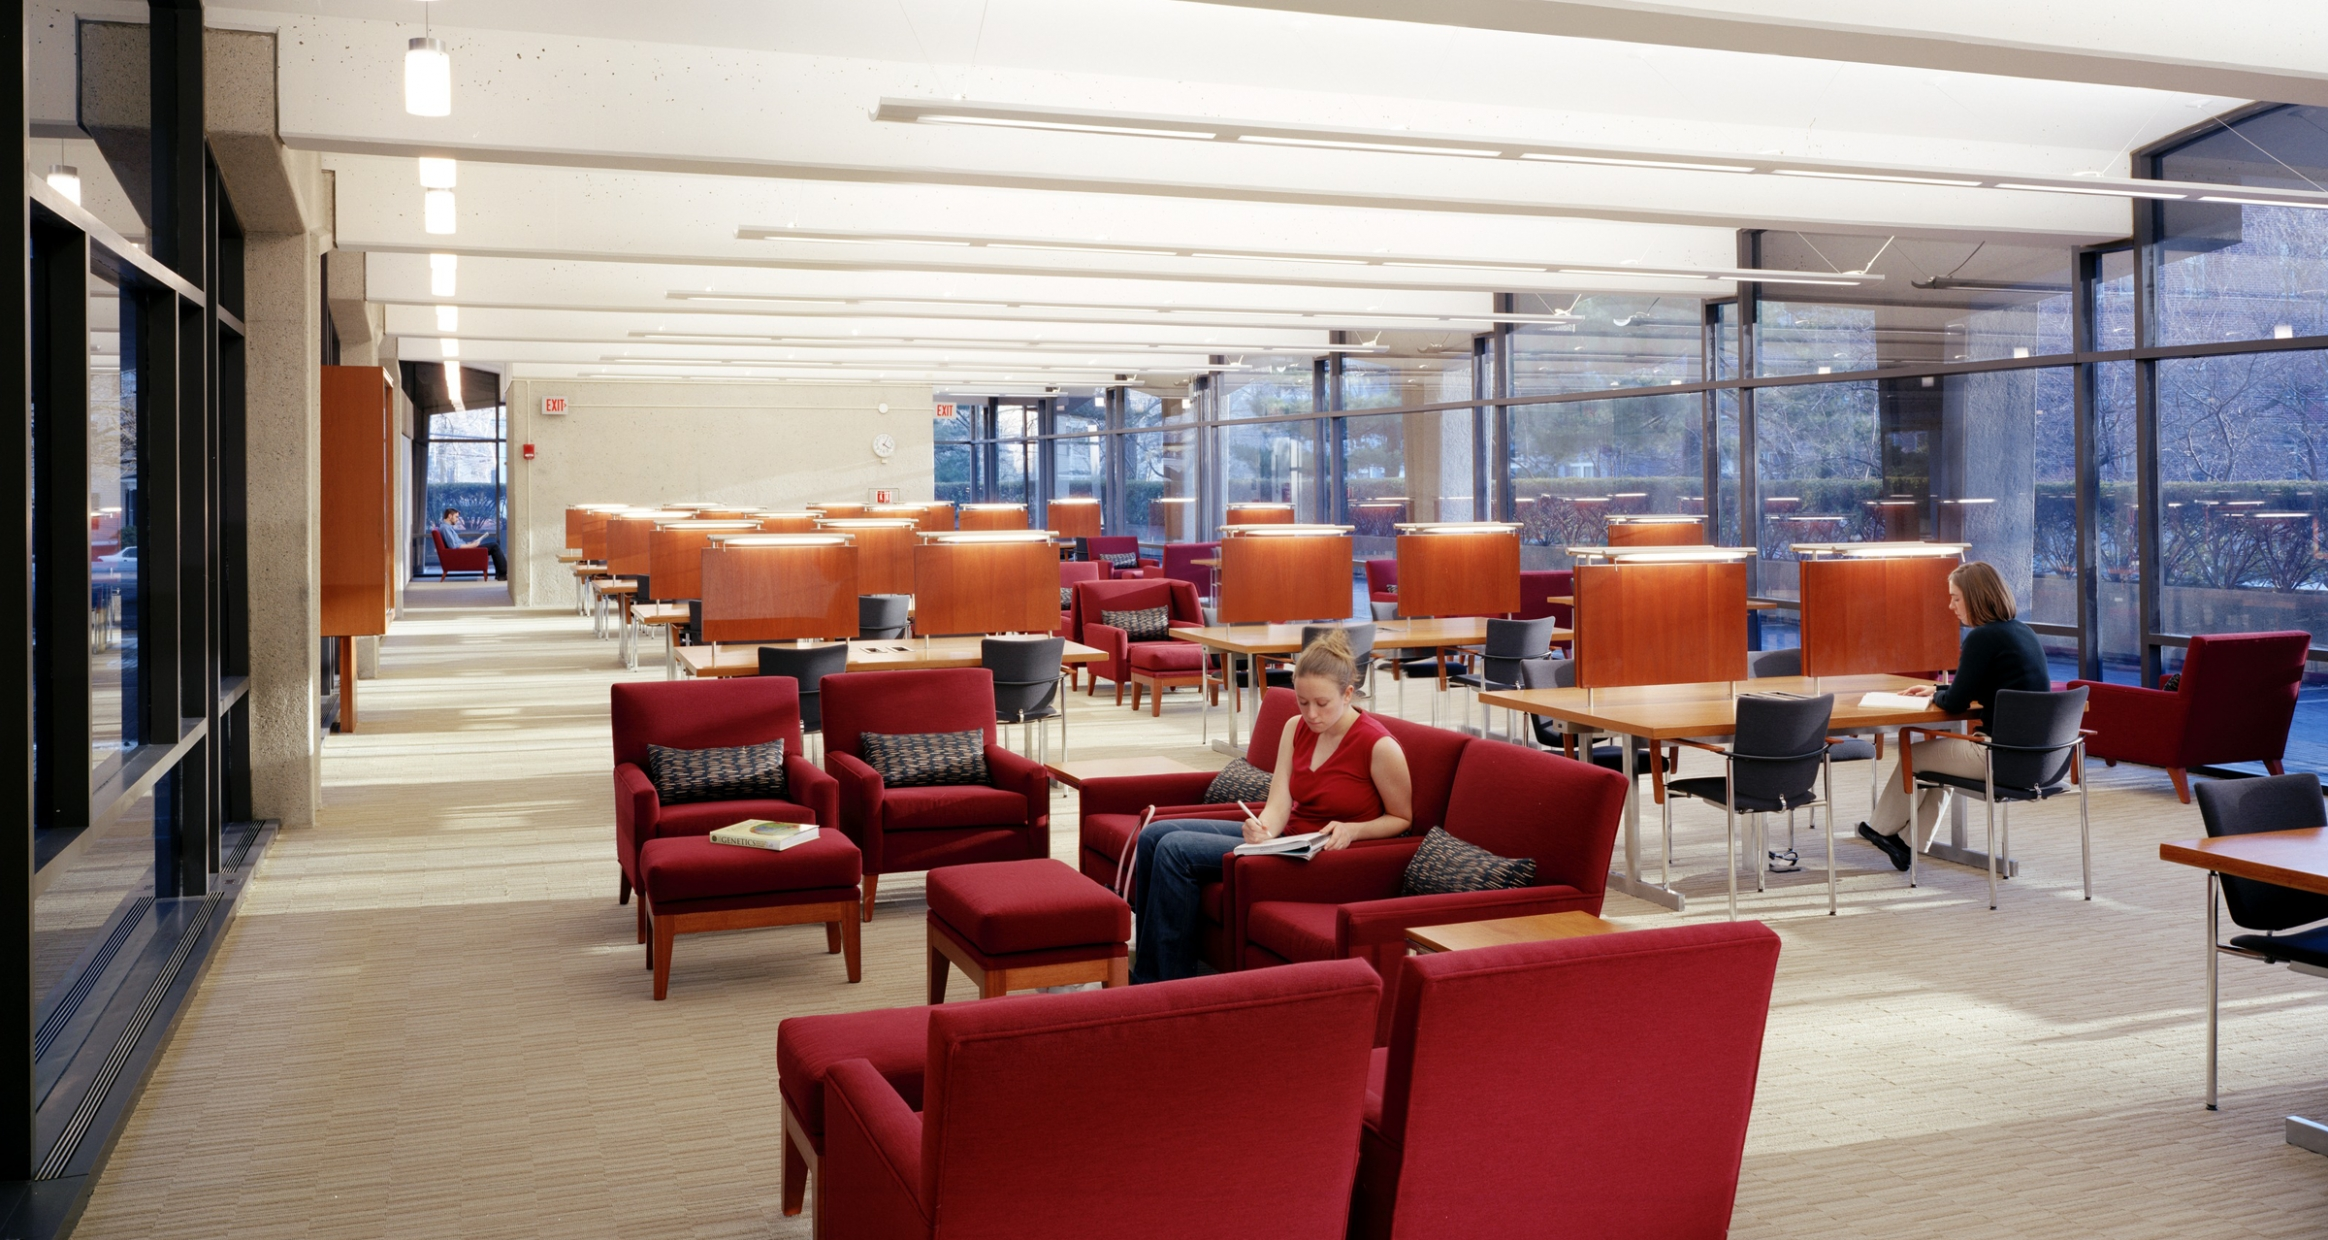 Hilles Library Harvard University